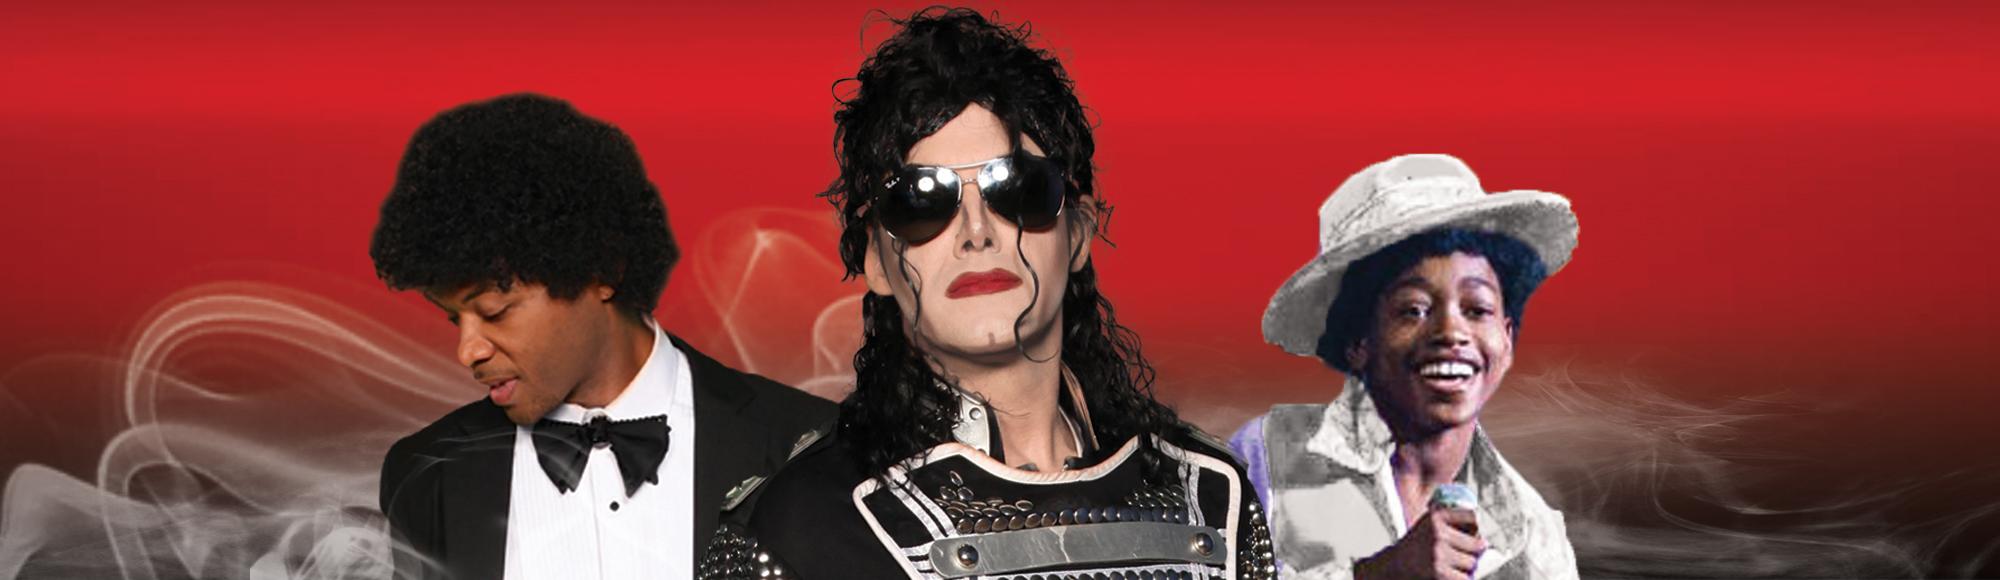 MJ The Evolution show